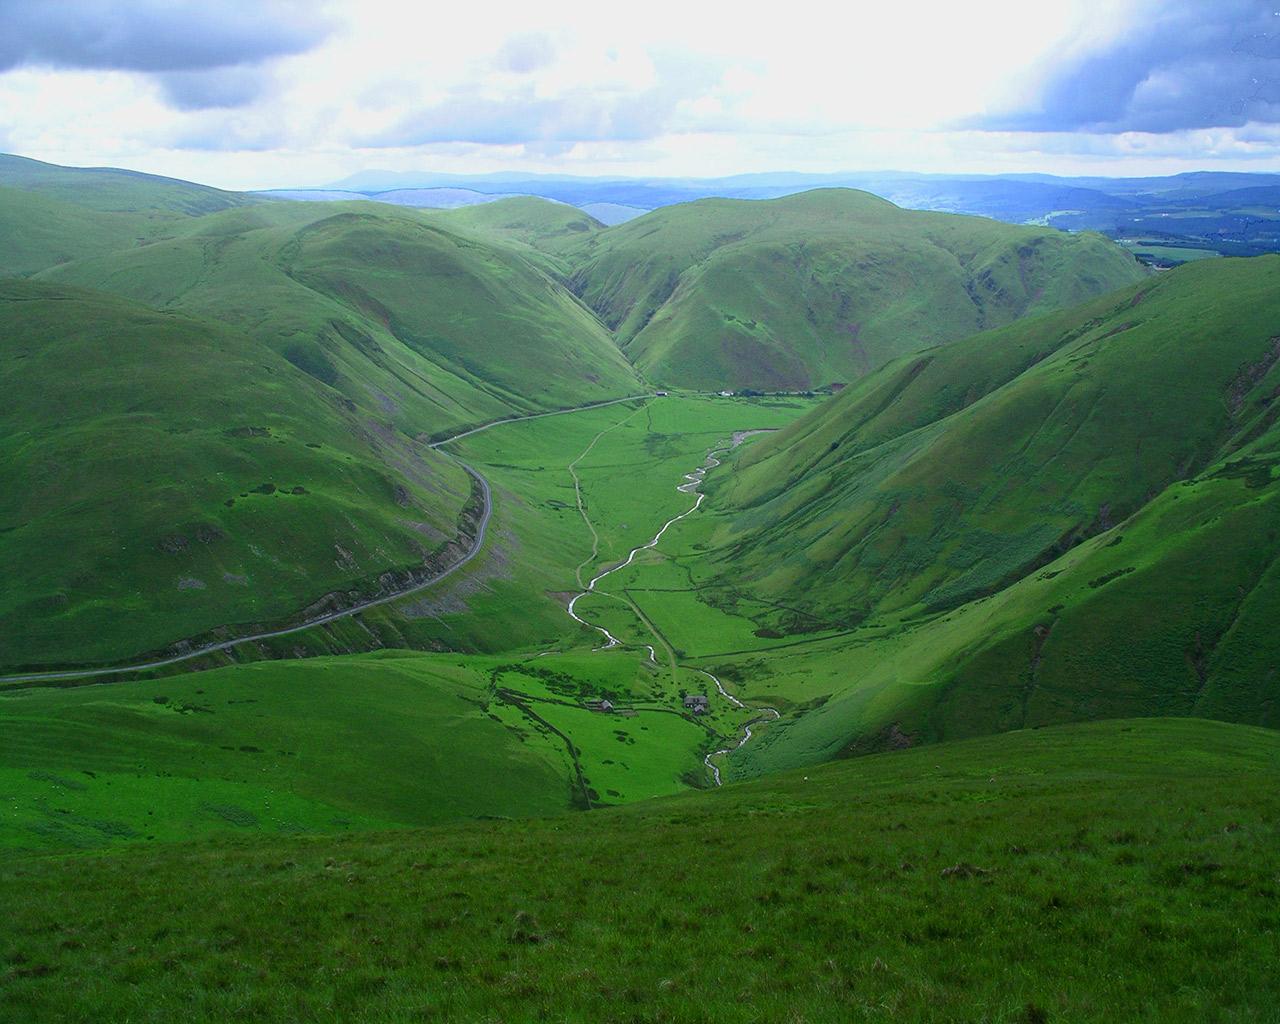 World landscape wallpapers scotland landscape part 2 - Scotland wallpaper ...